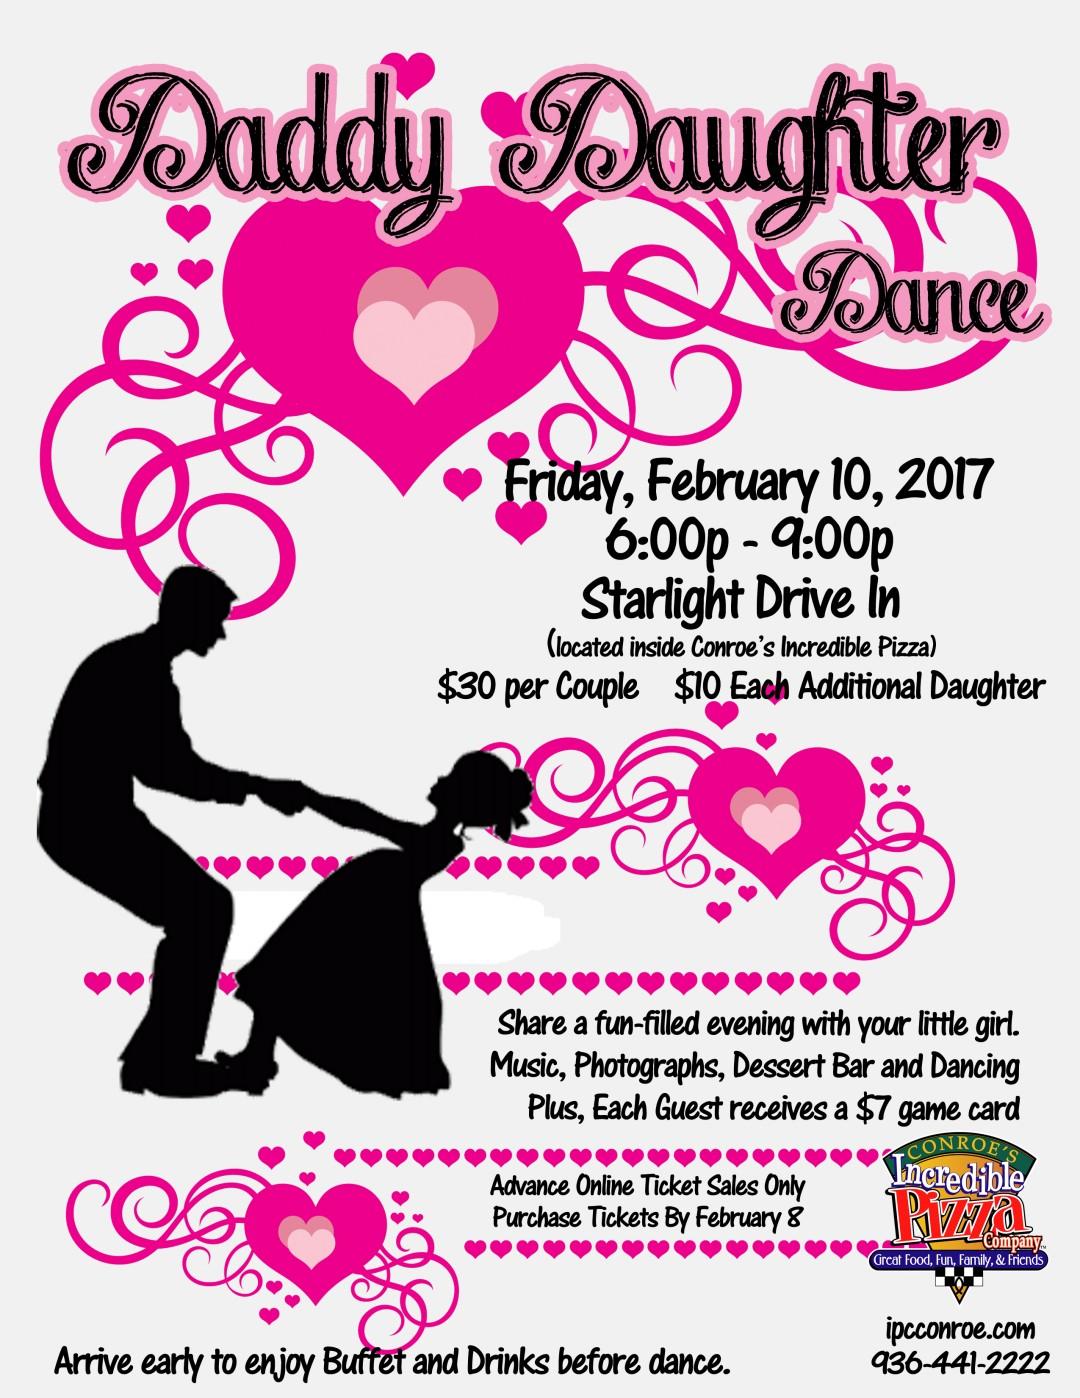 Daddy Daughter Dance – Fri., Feb. 10